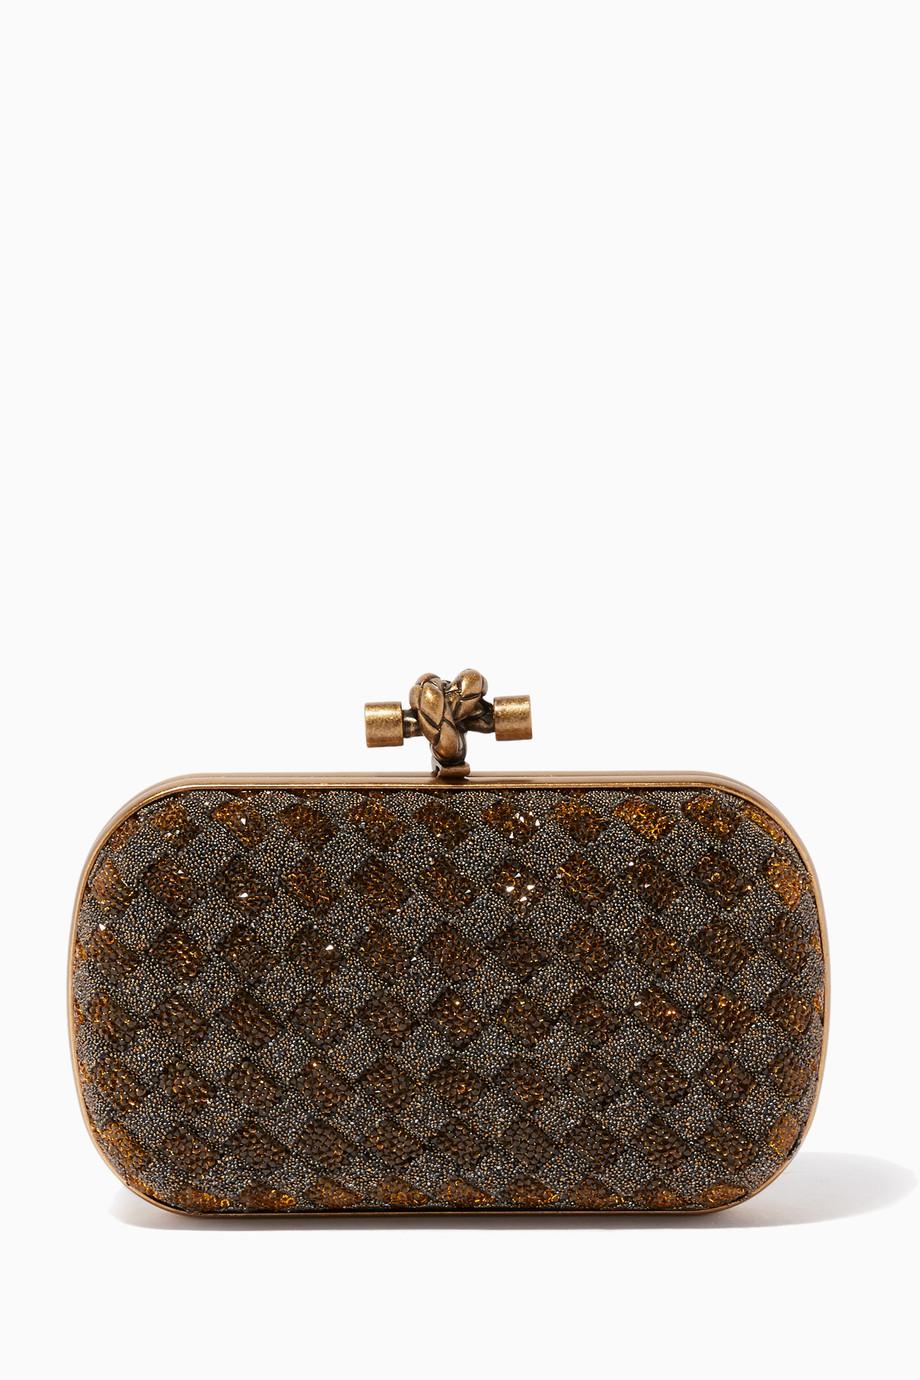 Shop Bottega Veneta Gold Bronzo Crystal Knot Clutch for Women ... 117f47b152fef